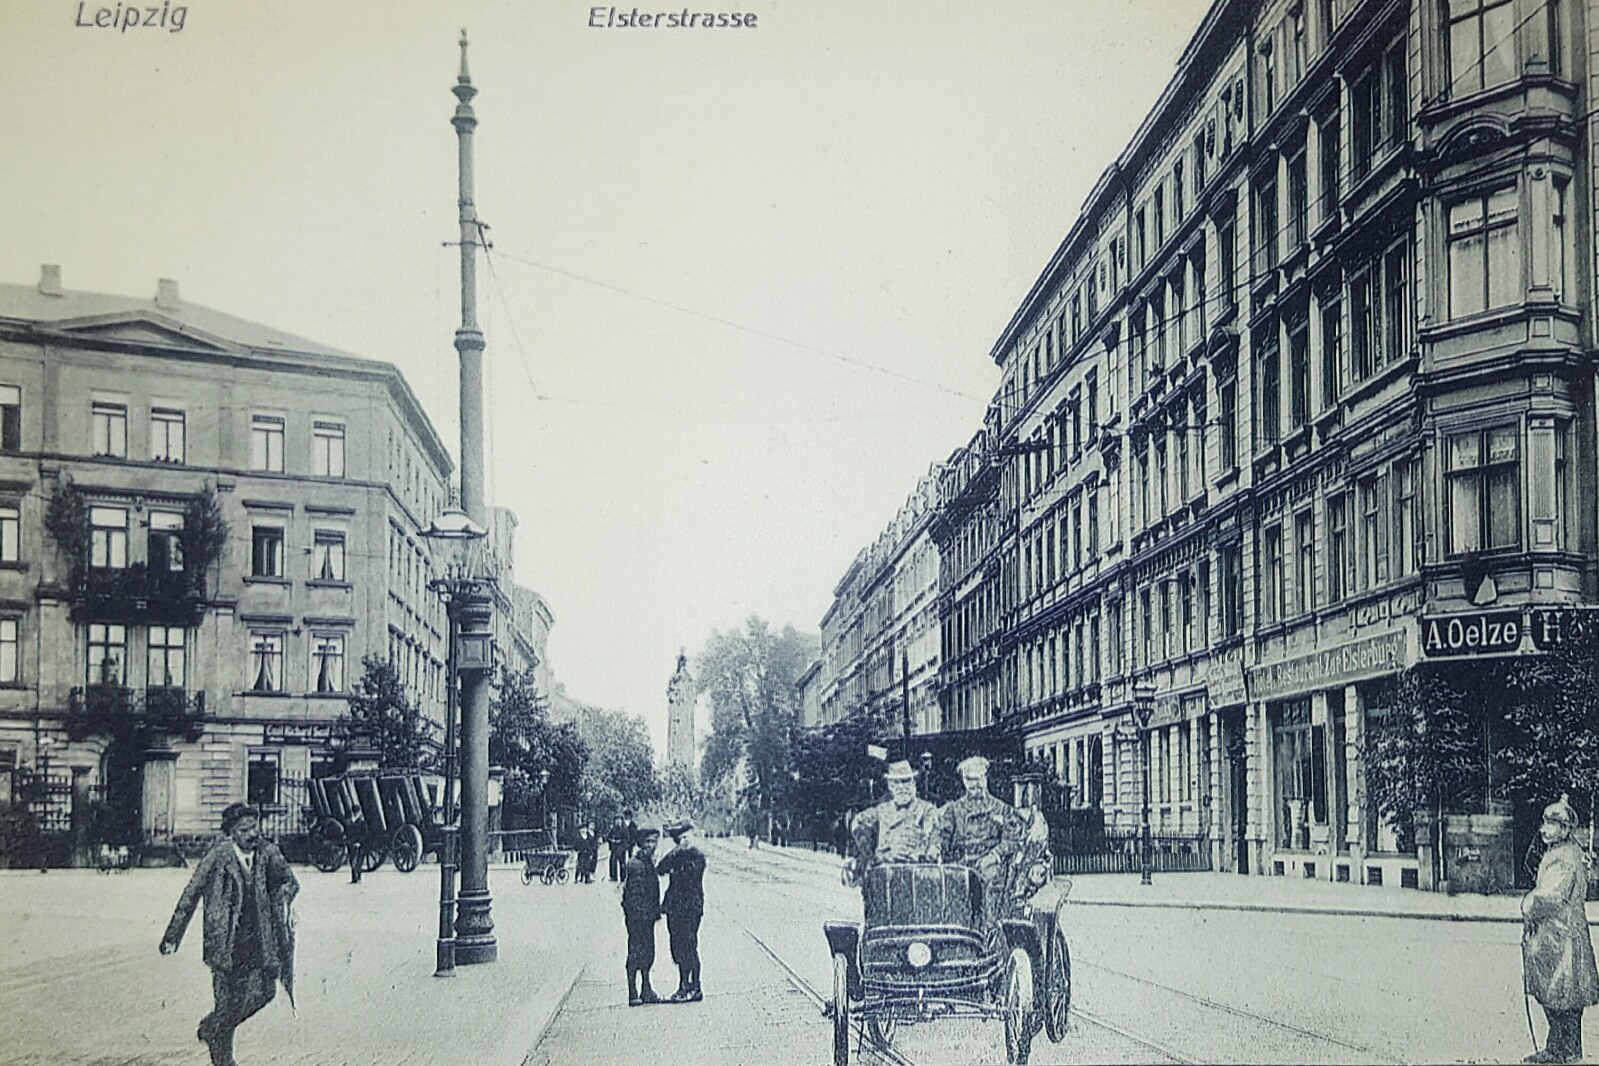 Die Elsterstraße 48 um 1910; Quelle: Bürgerverein Waldstraßenviertel e. V.